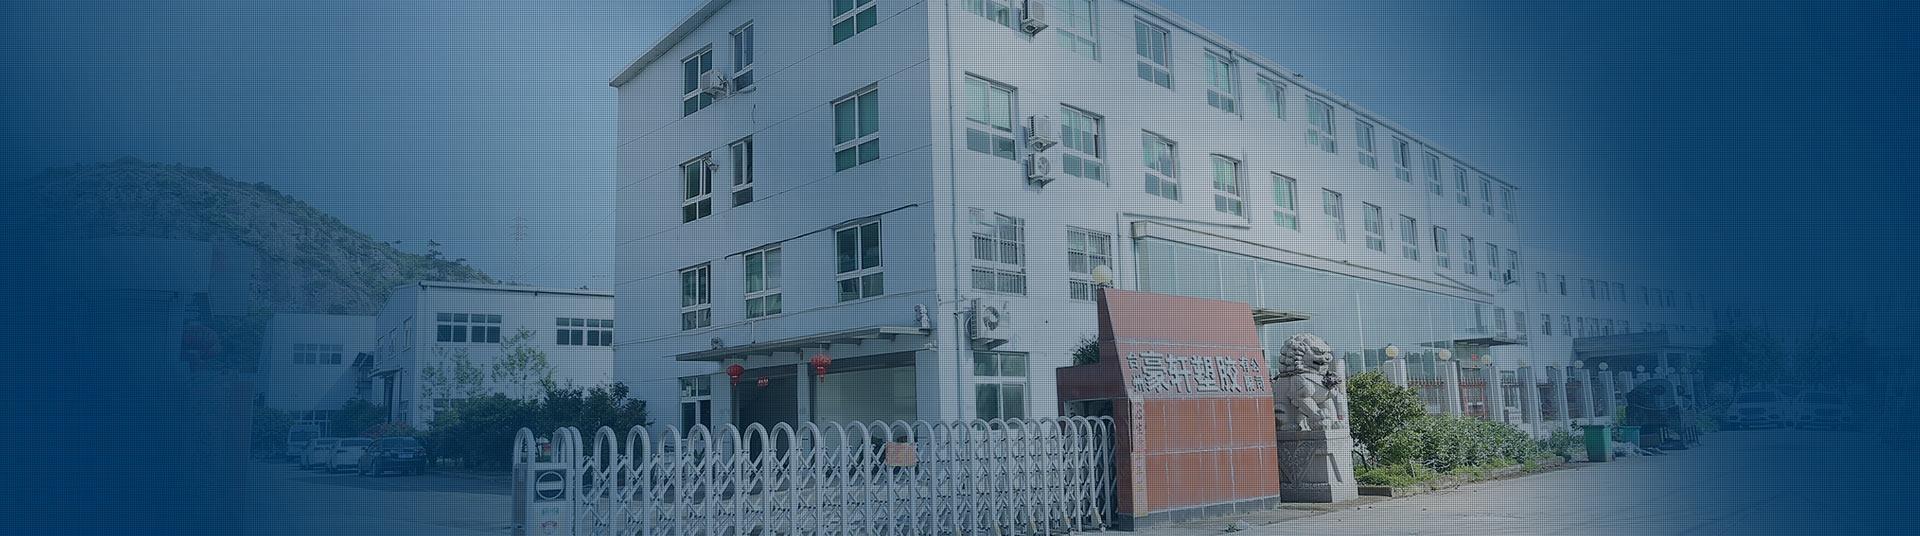 Taizhou Haoxuan Plastic Rubber Co., Ltd  (@haoxuanchina) Cover Image